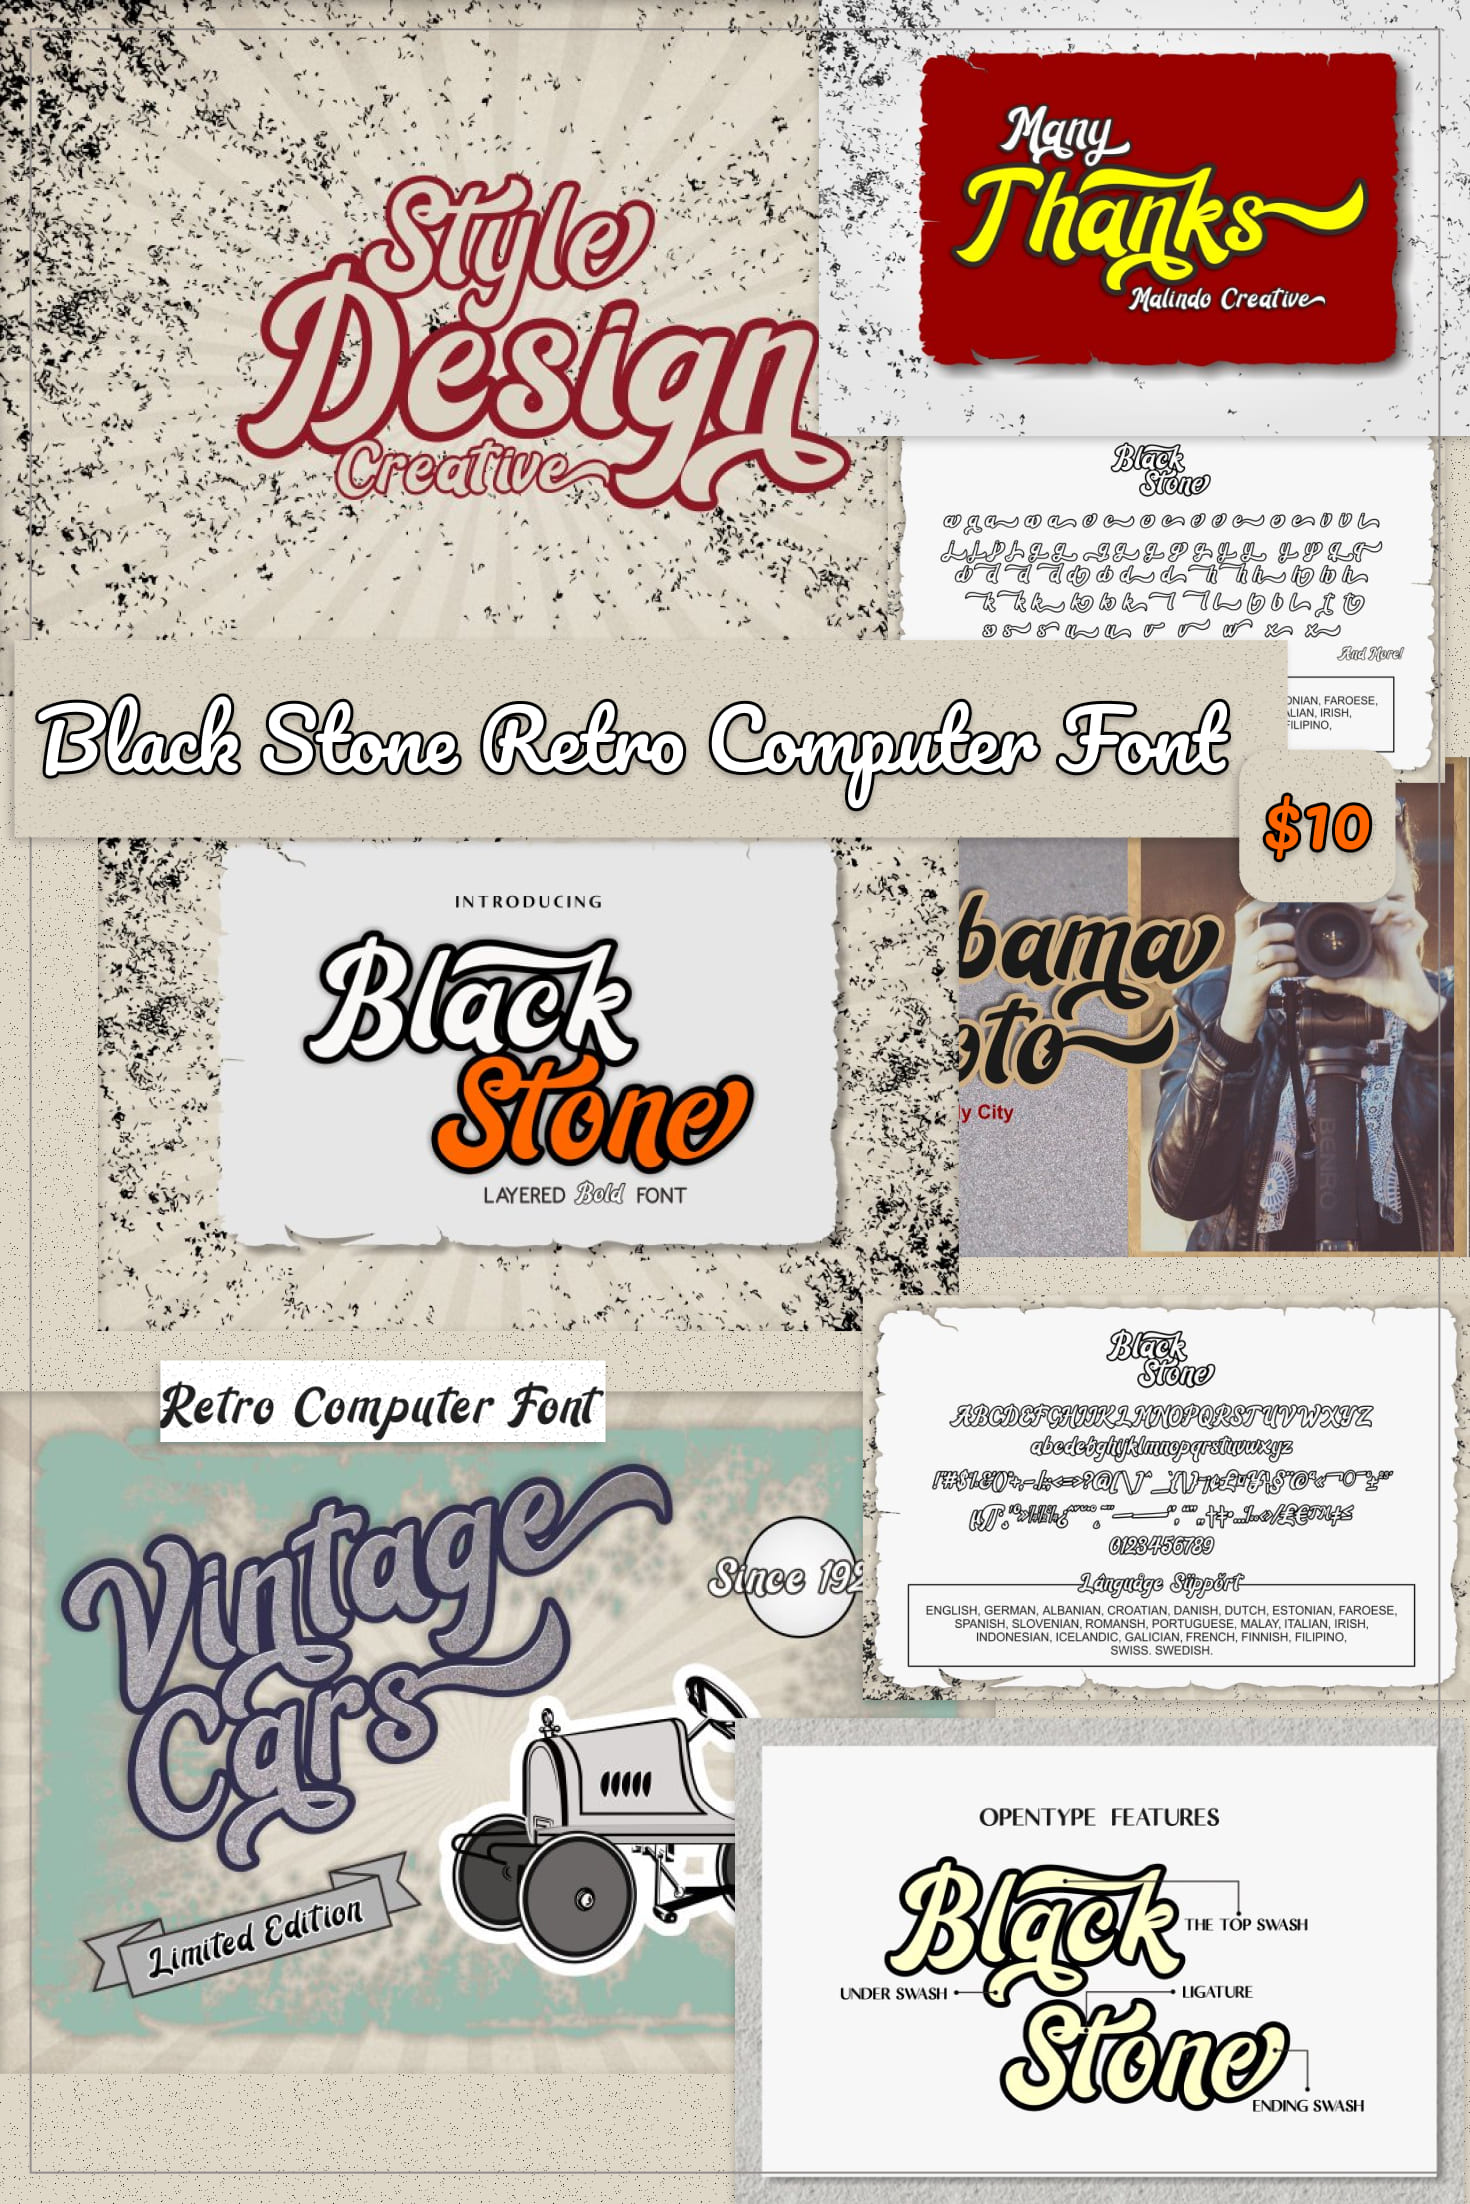 Pinterest Image: Black Stone Retro Computer Font.